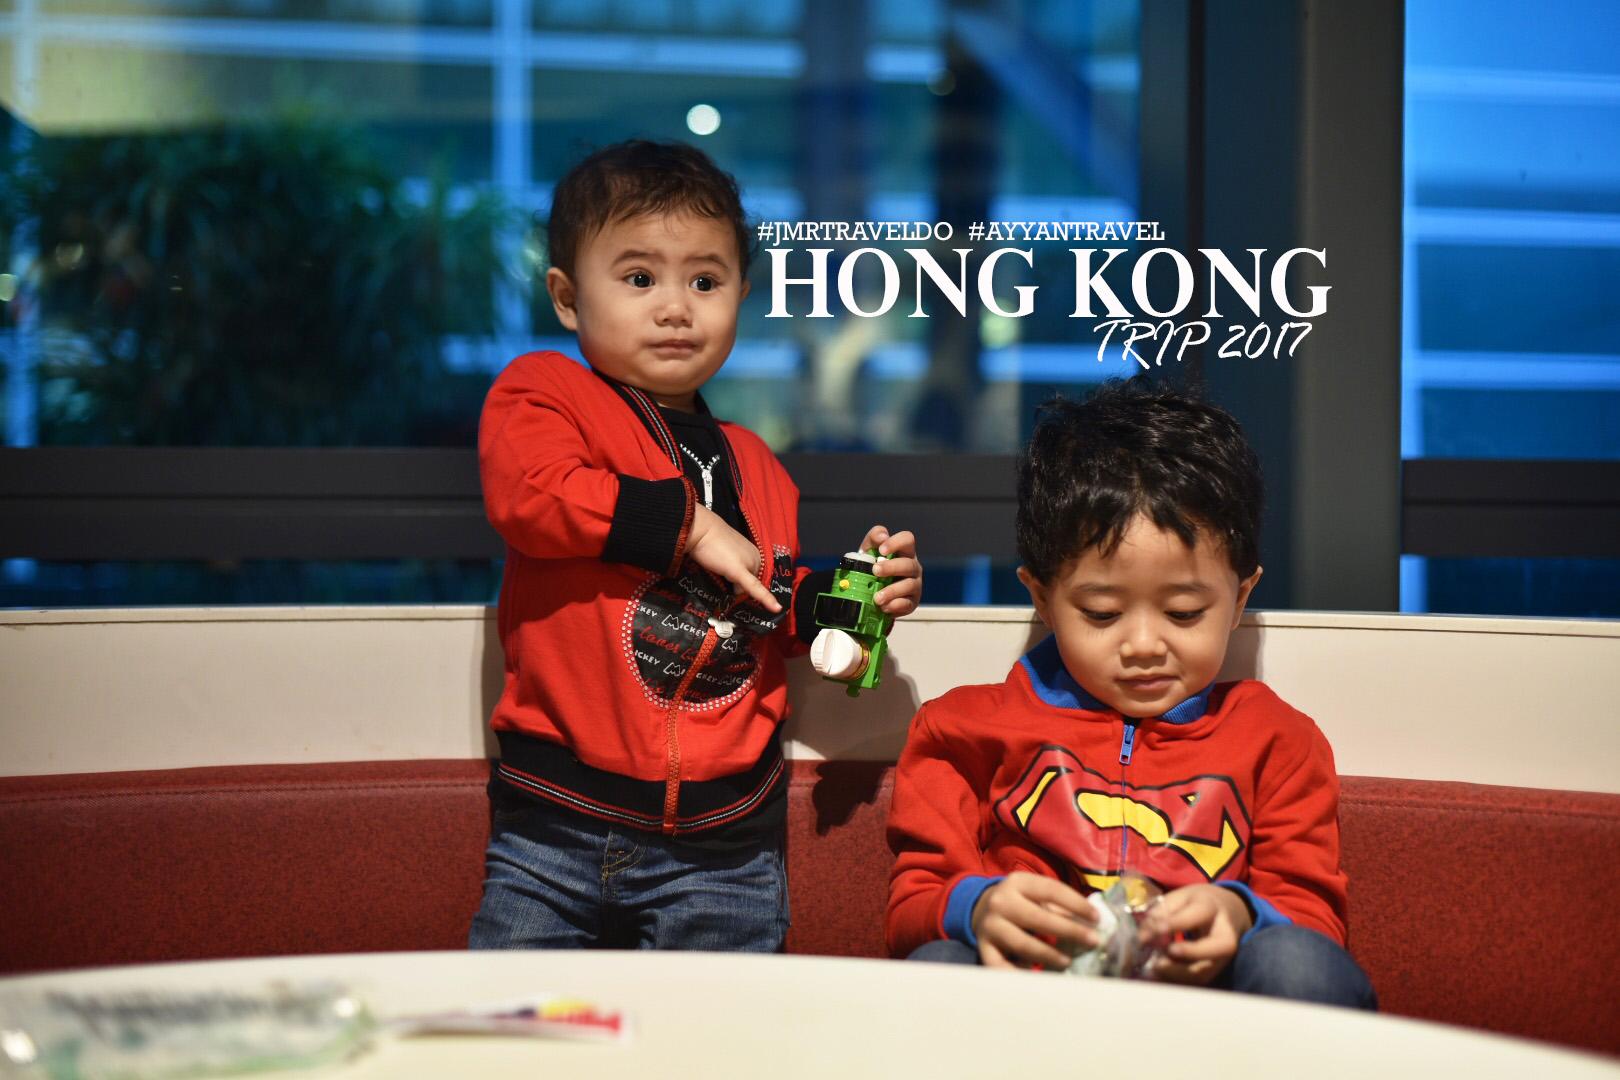 Day 1: Travel ke Hong Kong Dengan Dayyan & Danish.